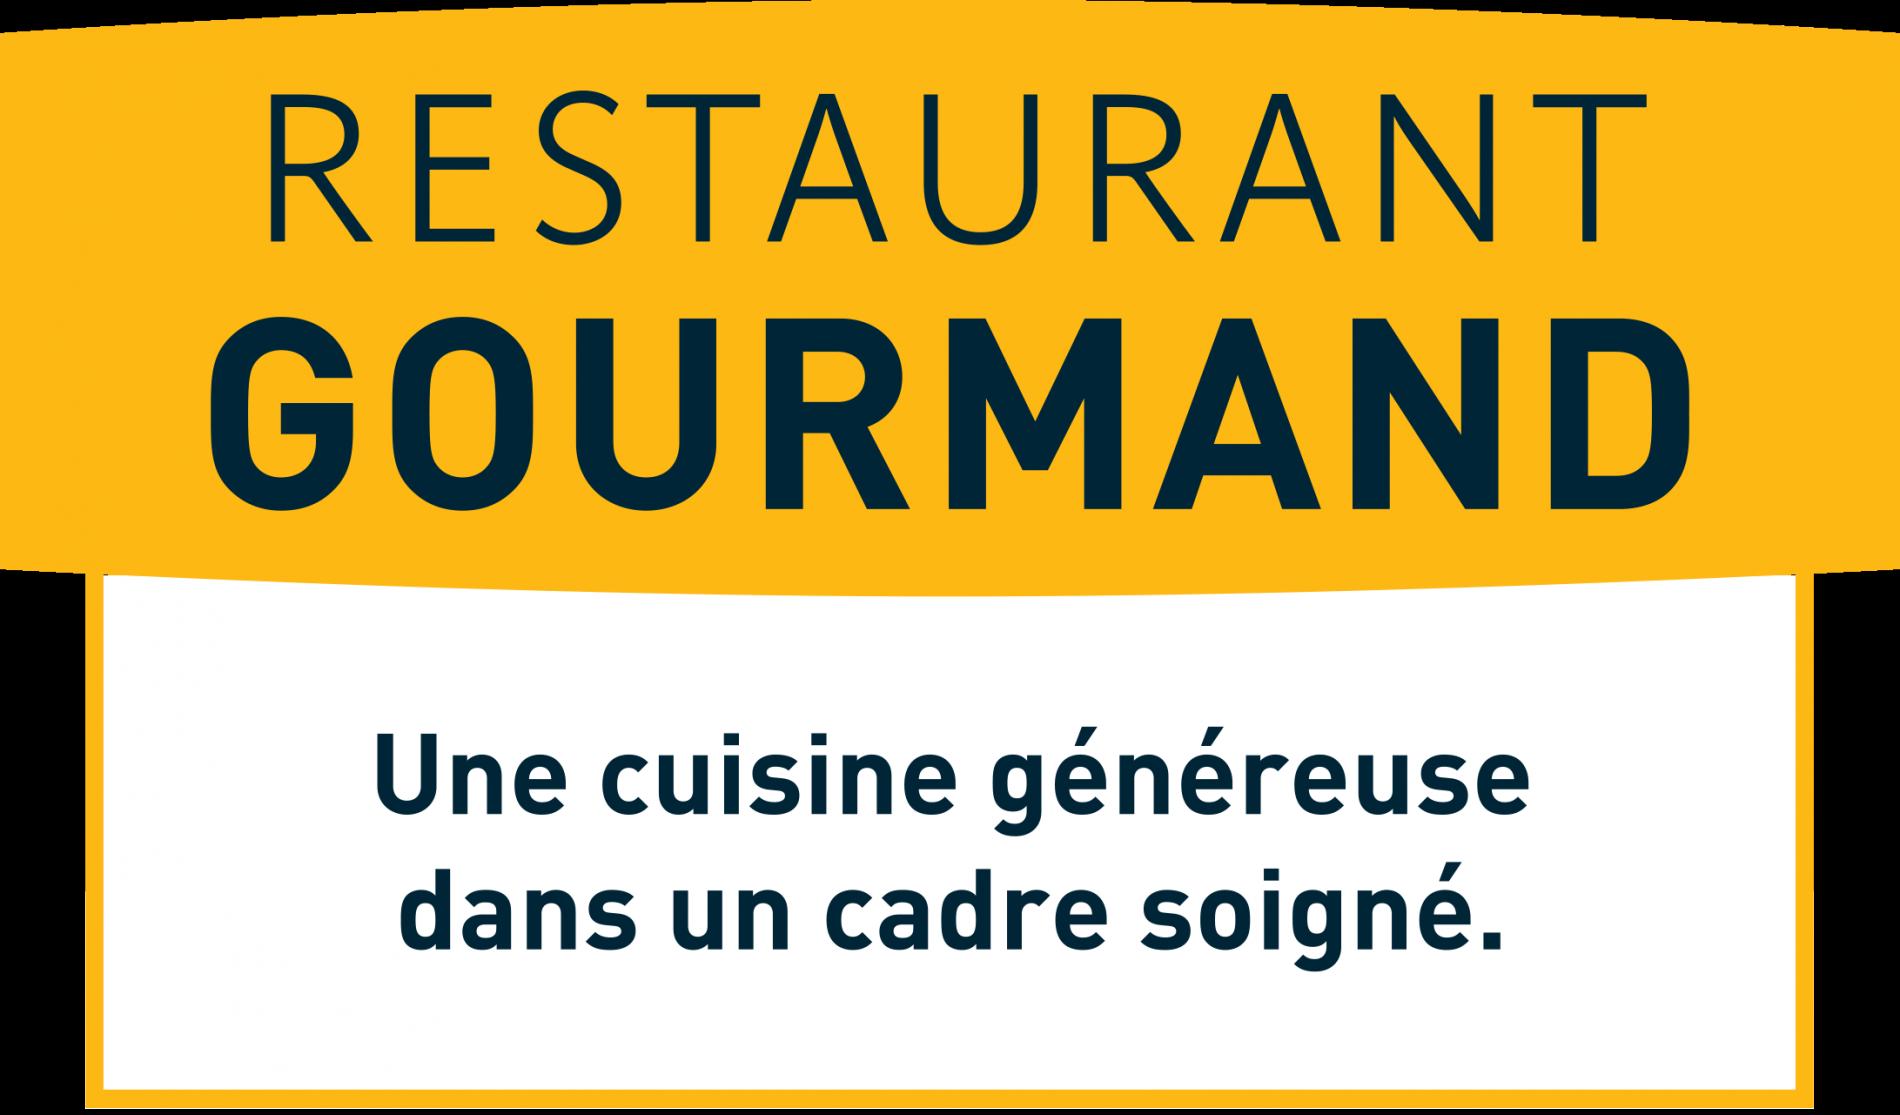 Logis Hotellerie Saint Jean à Thouars - logo Logis Restaurant Gourmand